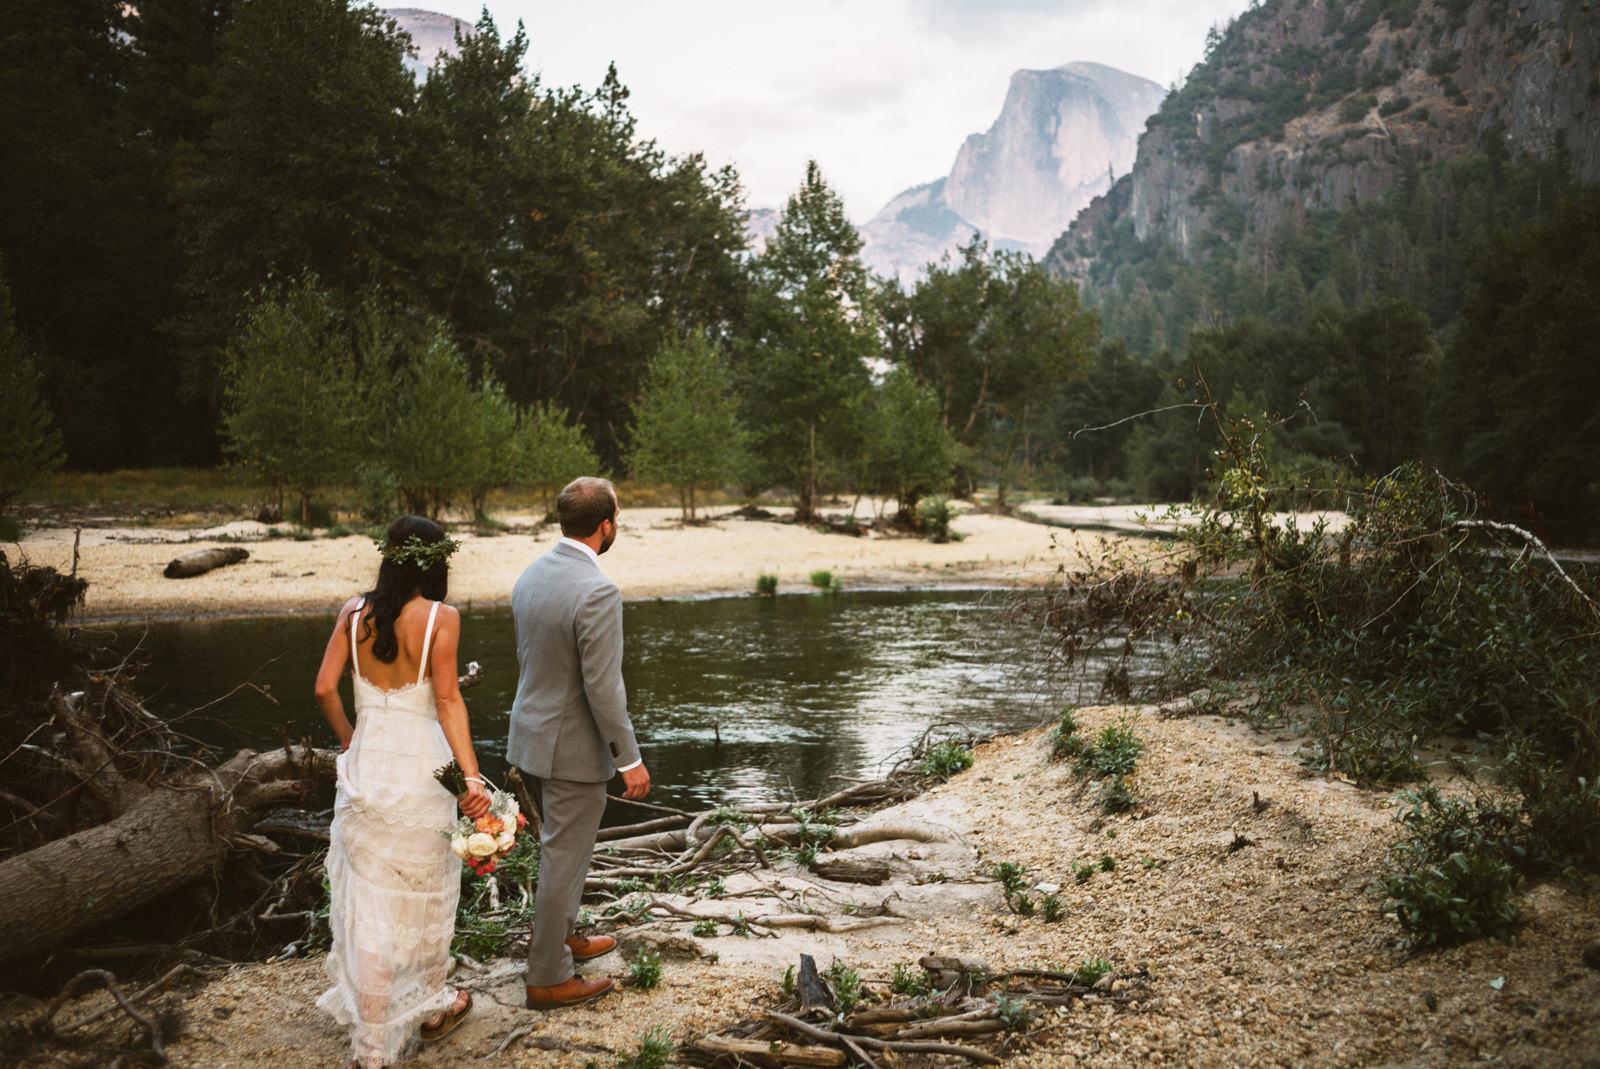 yosemite-intimate-wedding-087 YOSEMITE INTIMATE WEDDING